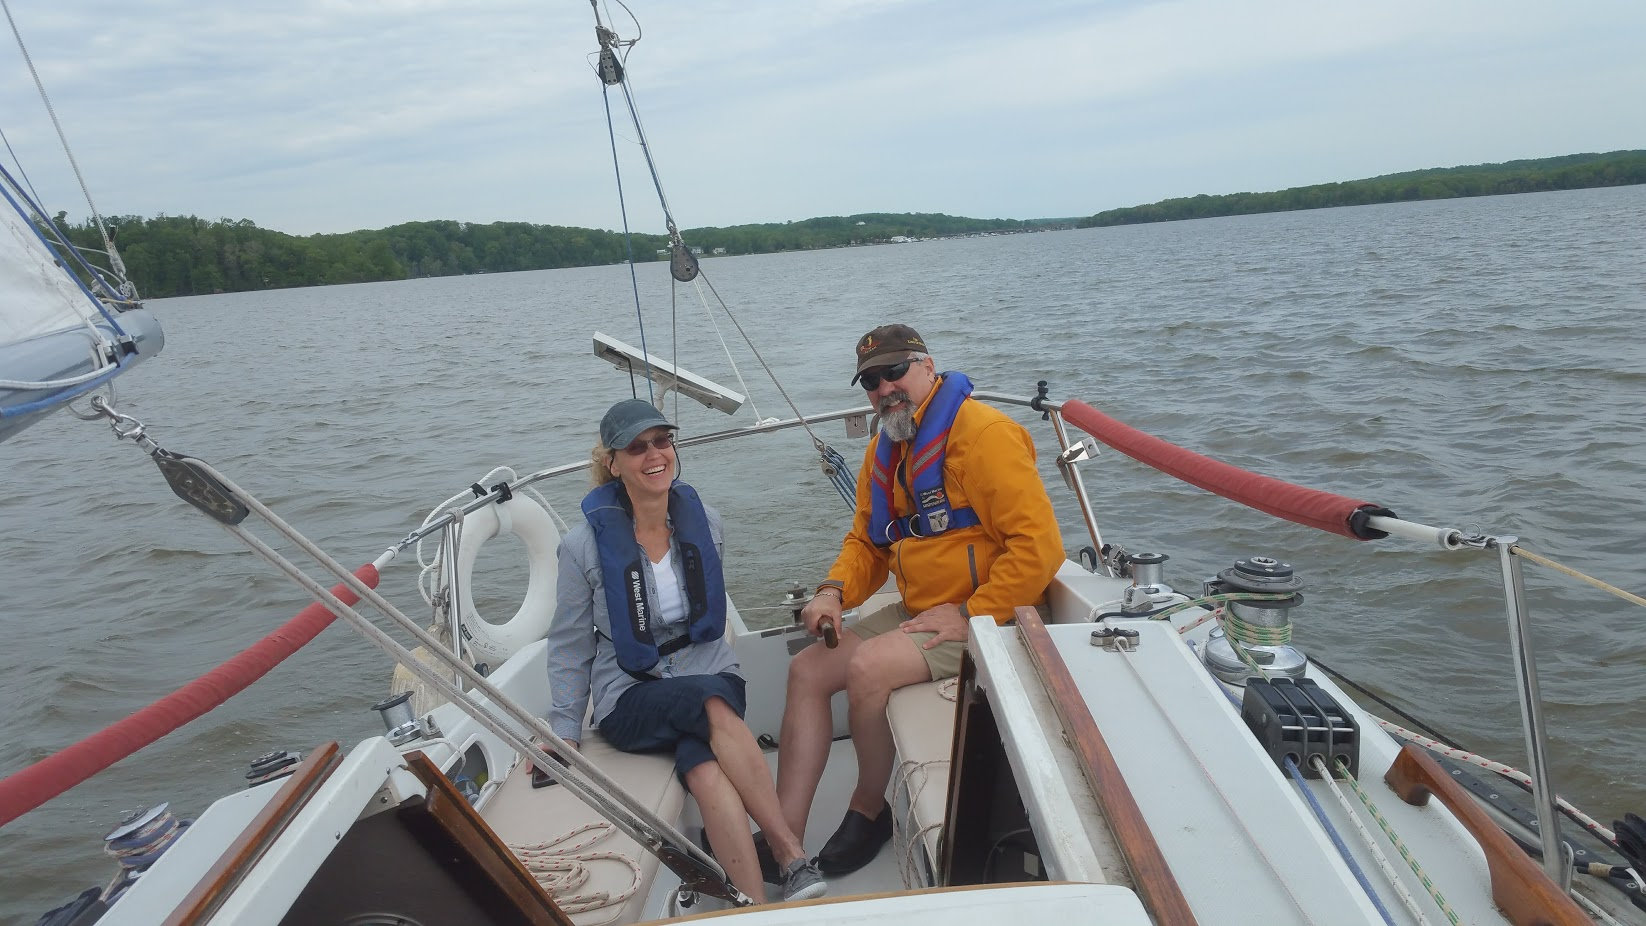 ASA 101 Beginning Keelboat Sailing